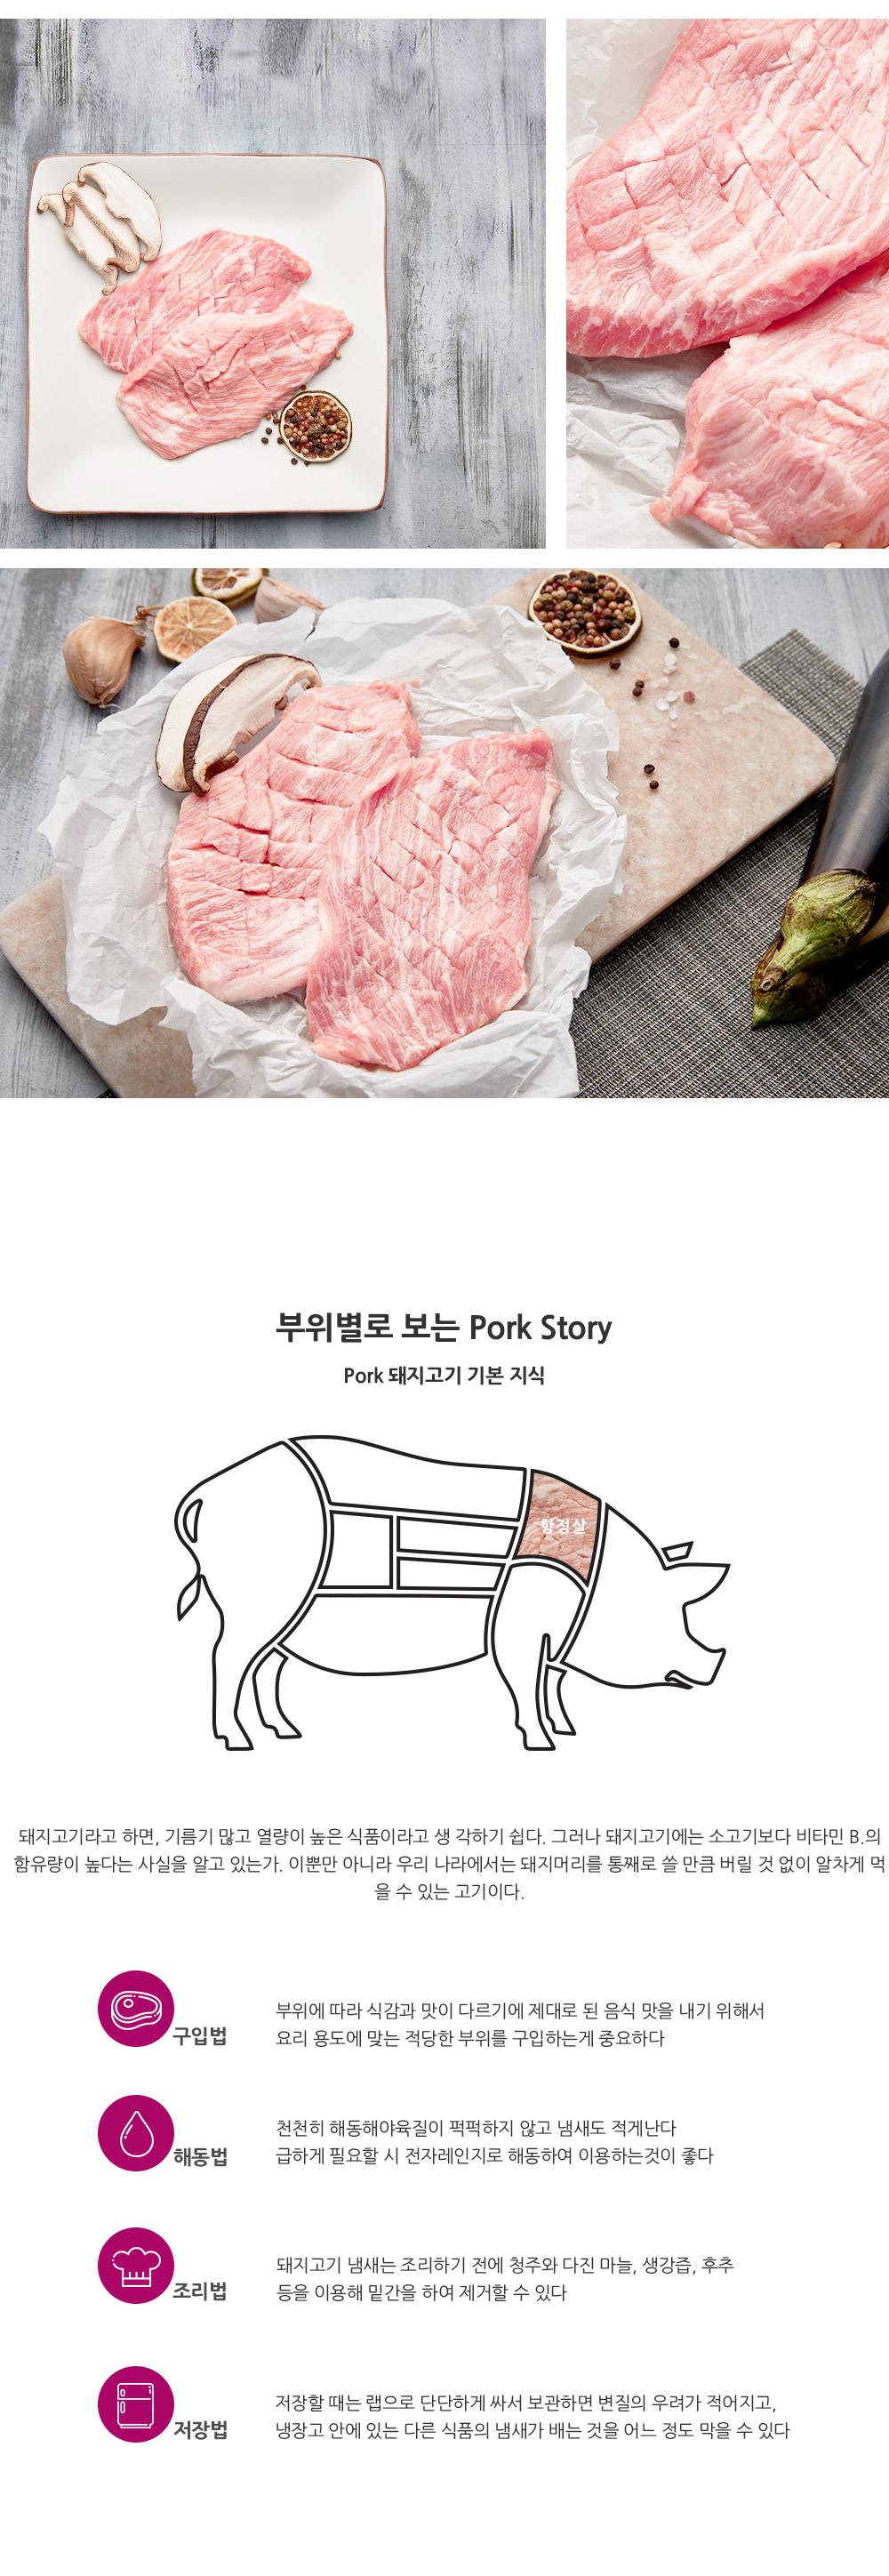 hangjeongsal_03.jpg